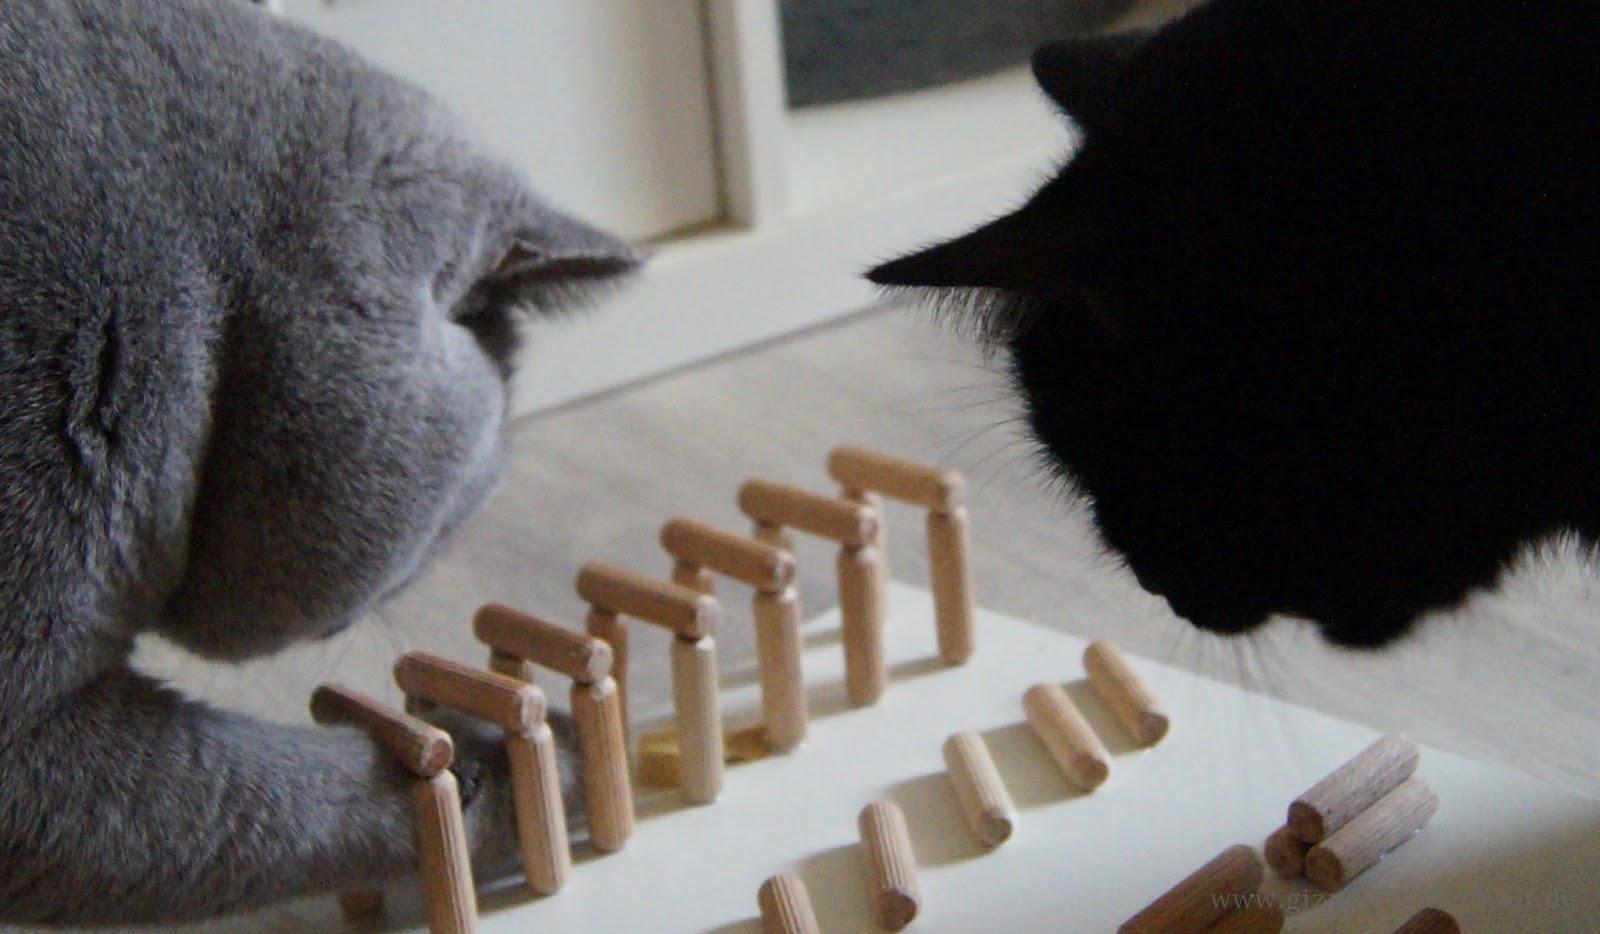 Katzenblog alltag auf 4 pfoten diy fummelbrett aus - Wanddekoration ka che selber machen ...